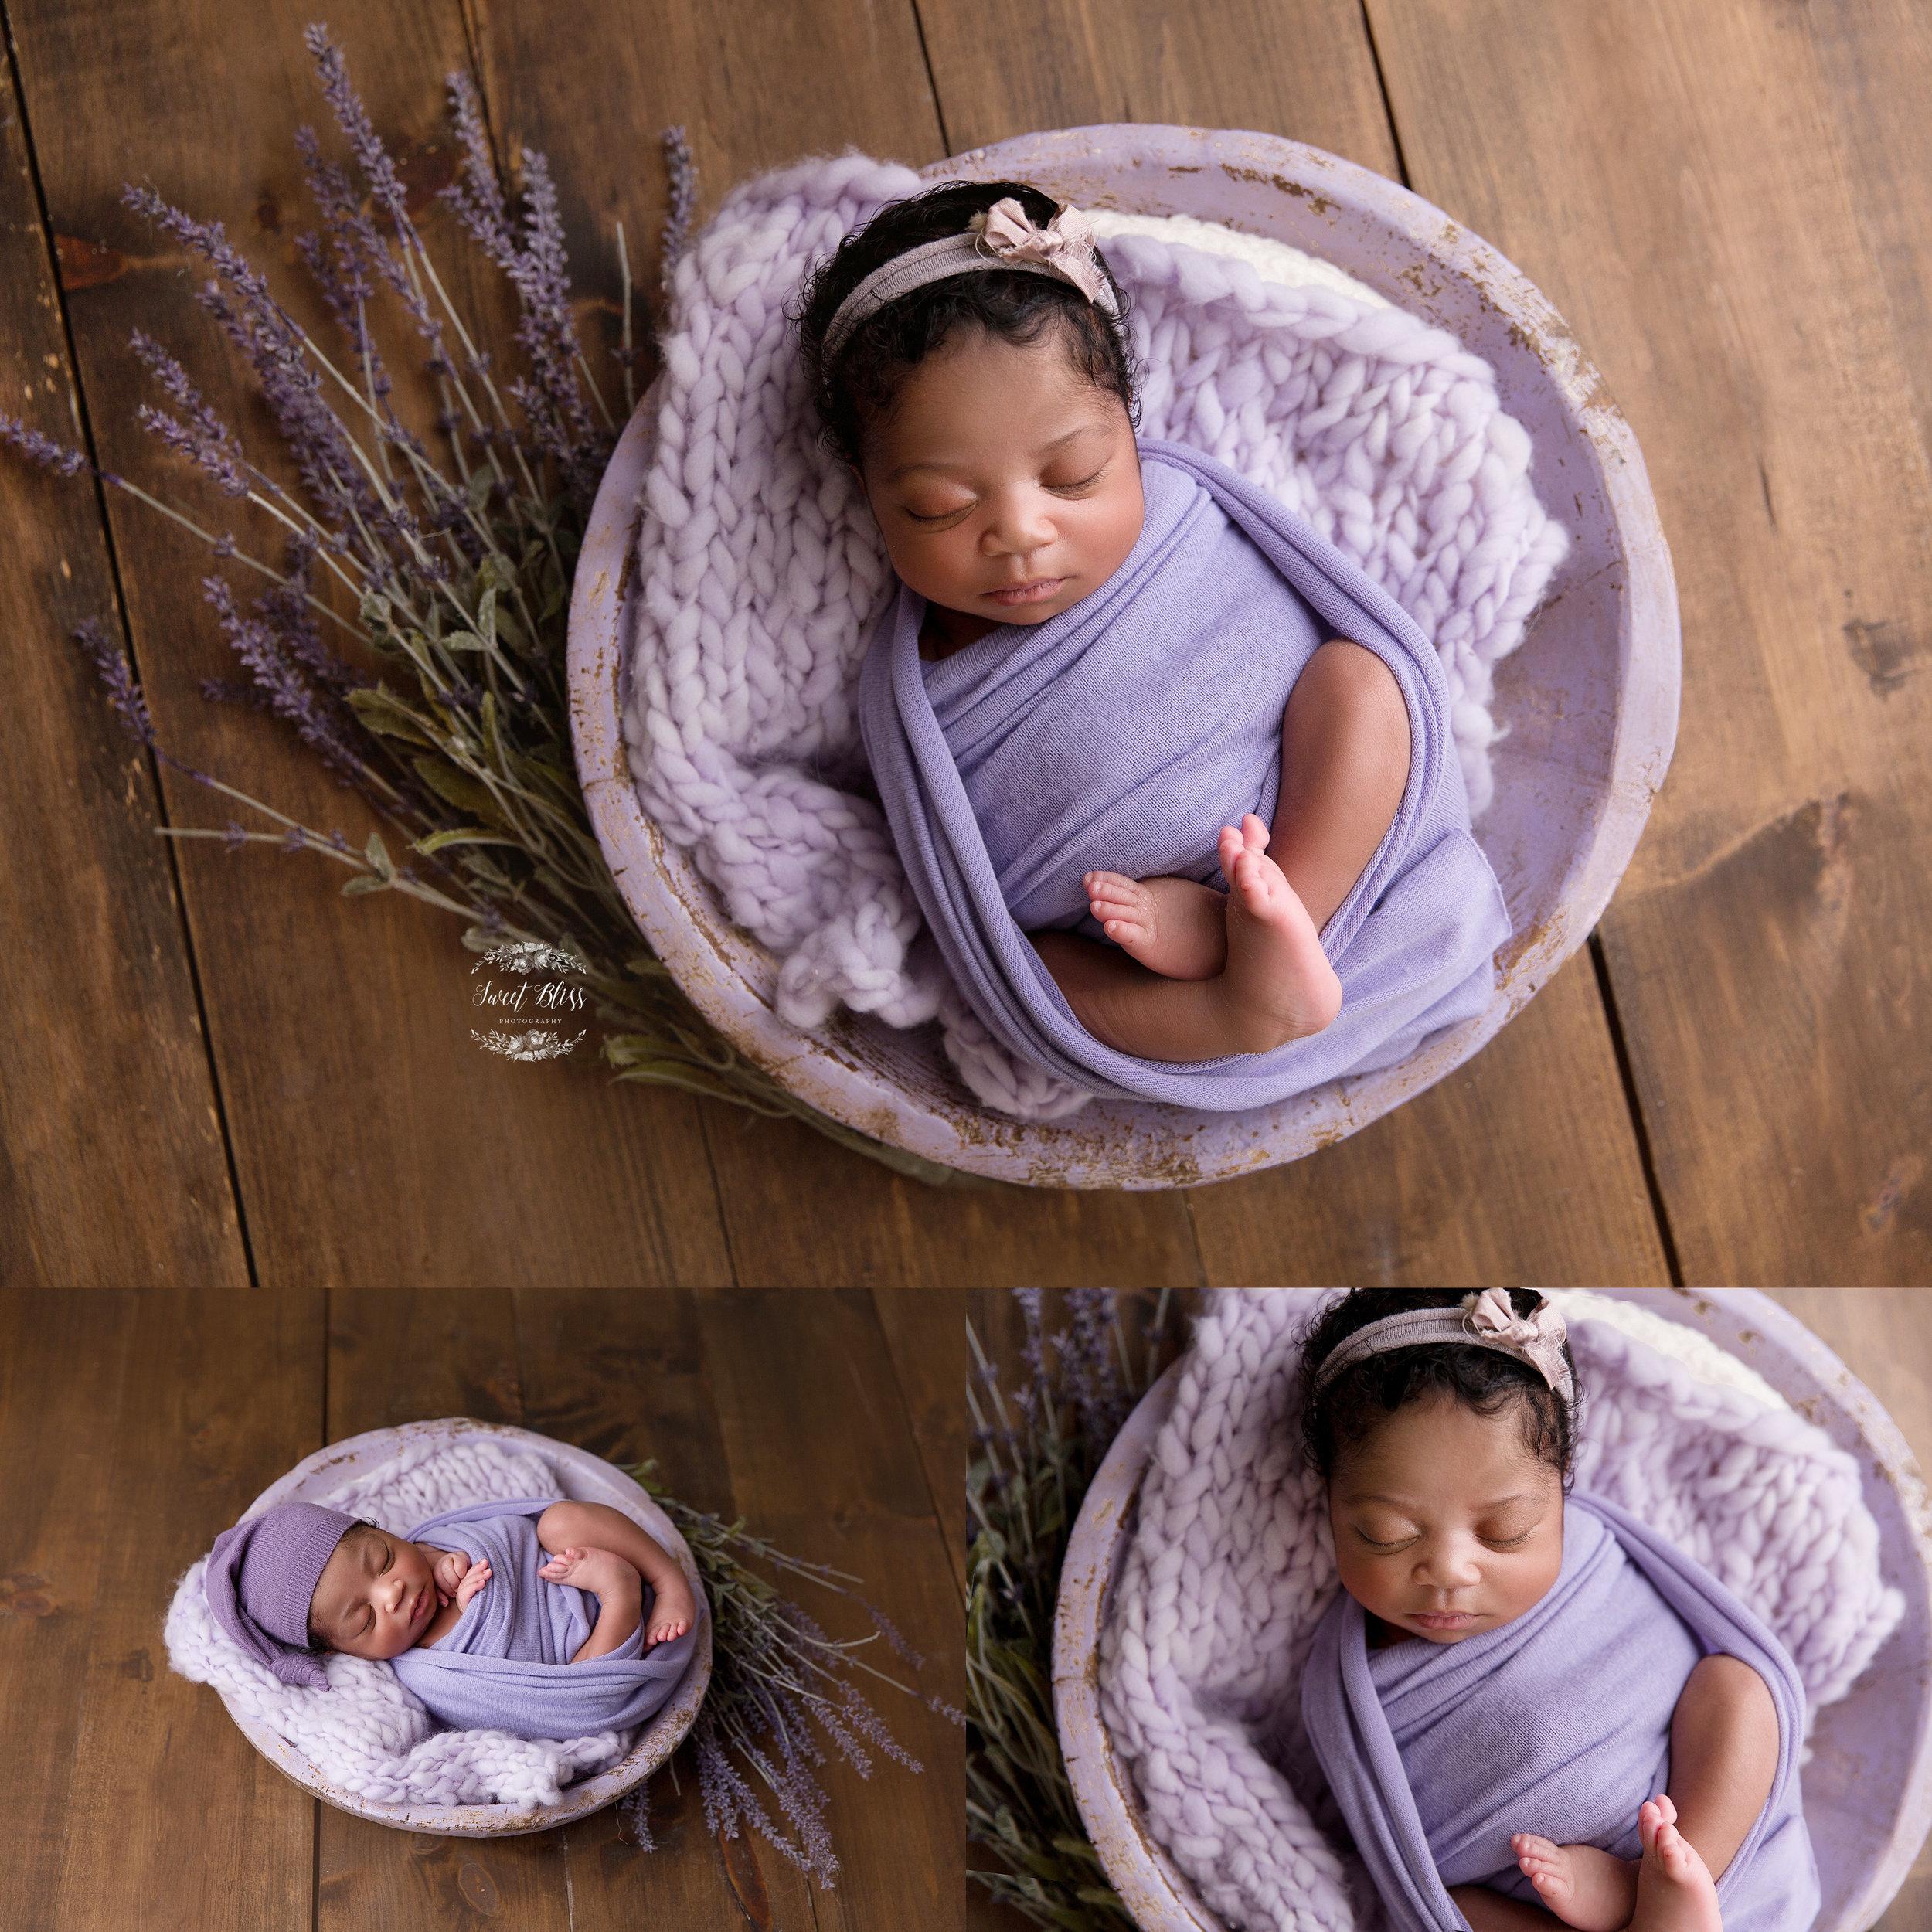 newbornphotographer_maryland_purplebowl1.jpg